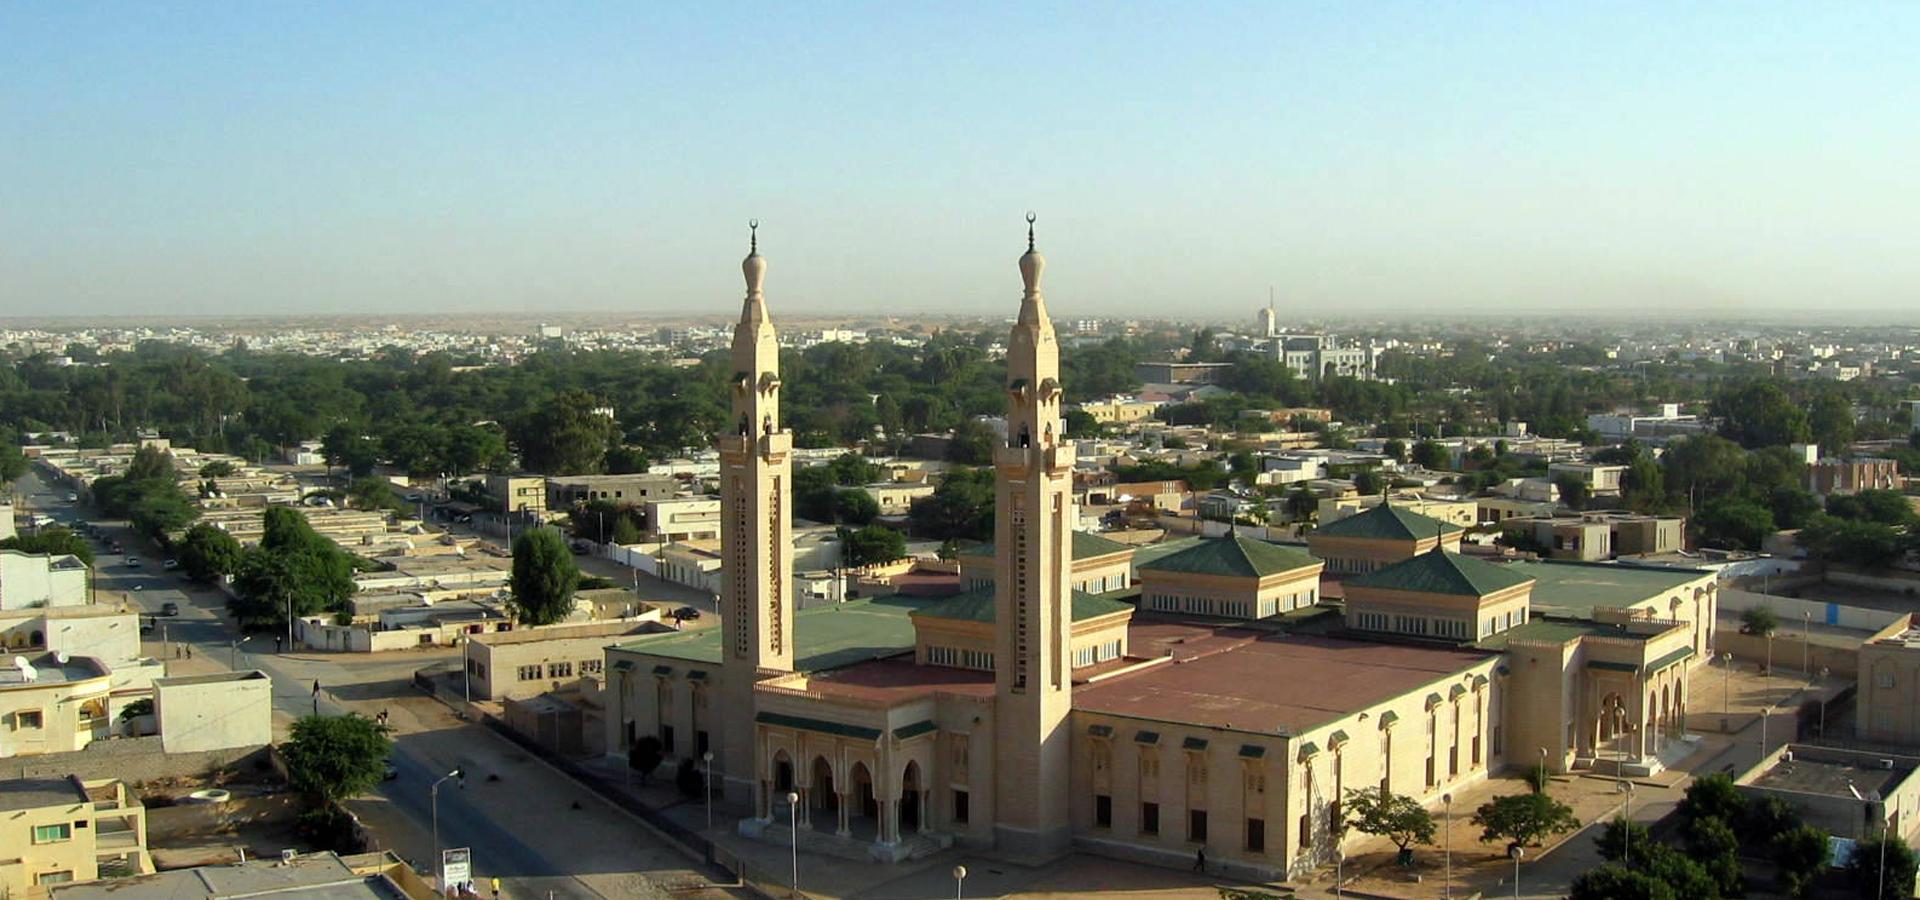 Peer-to-peer advisory in Nouakchott, Mauritania